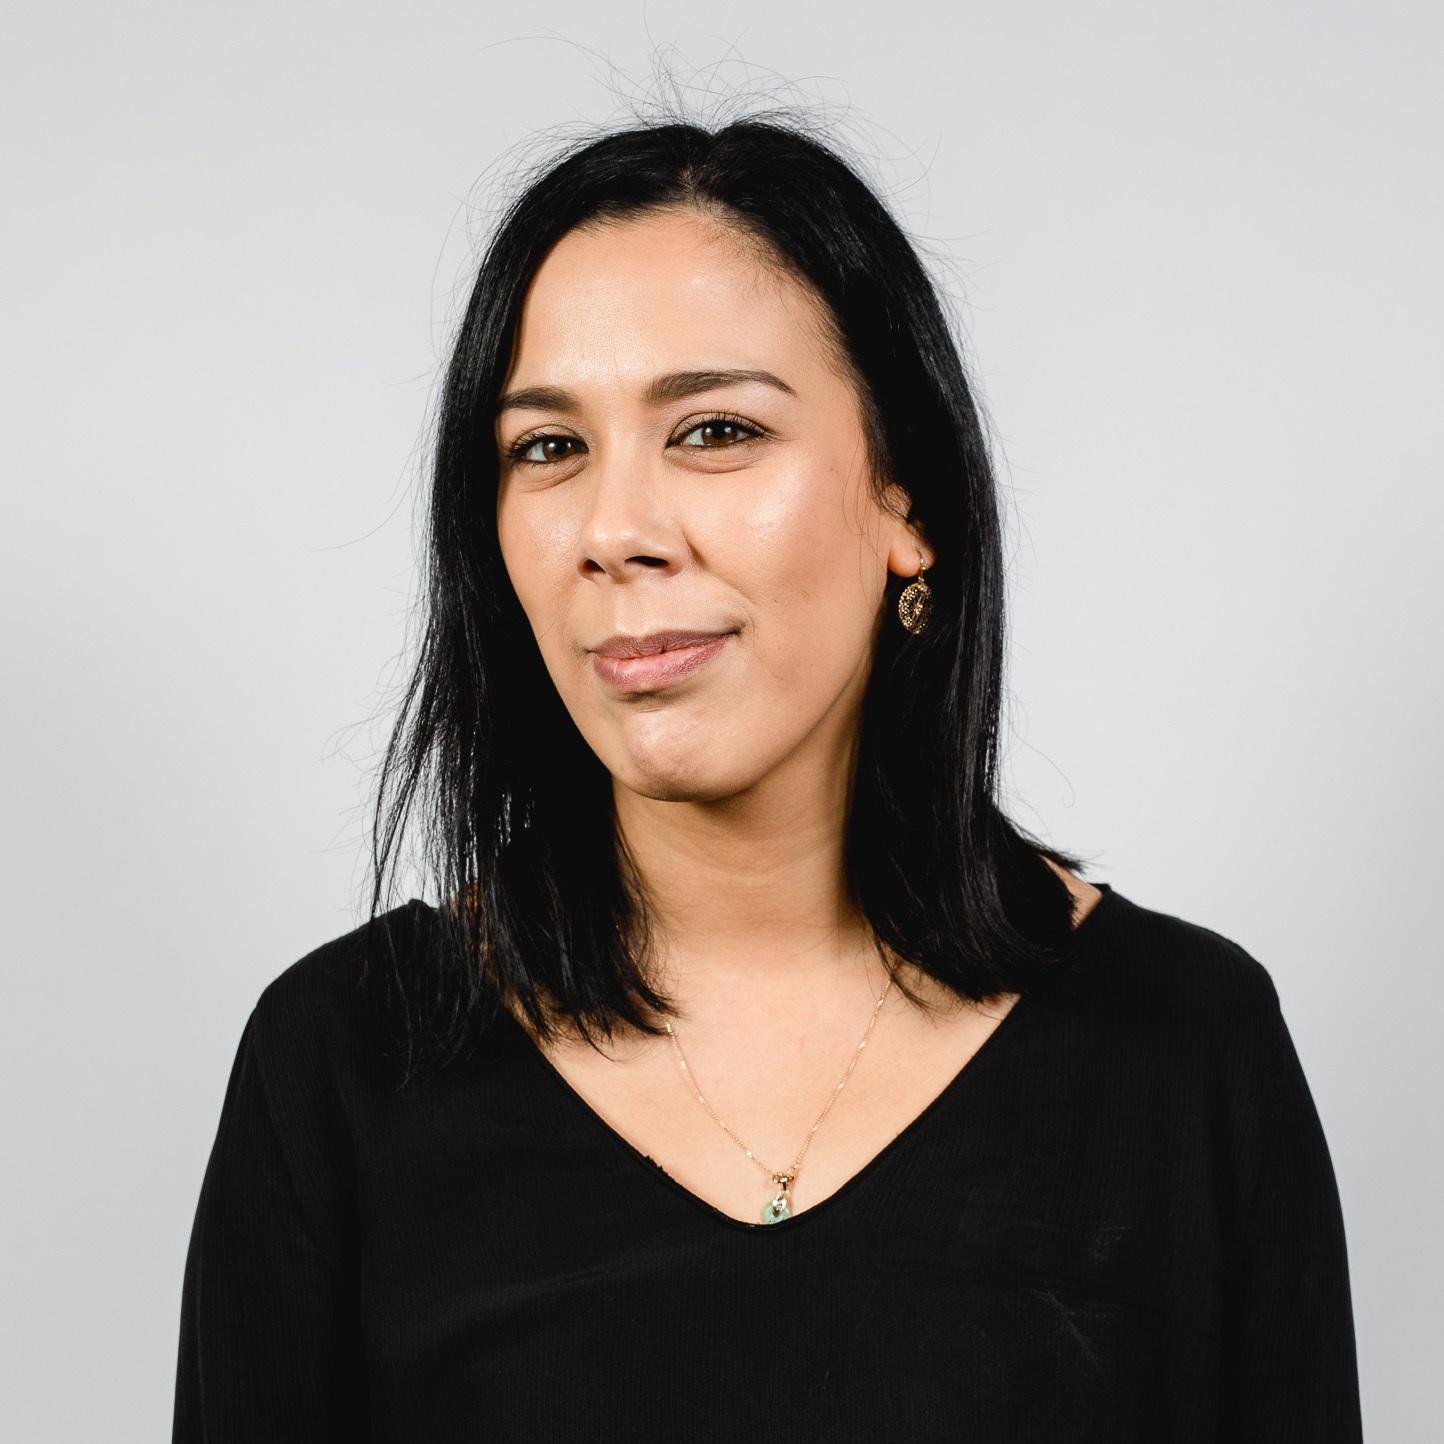 Samantha-Josefine Knefelkamp